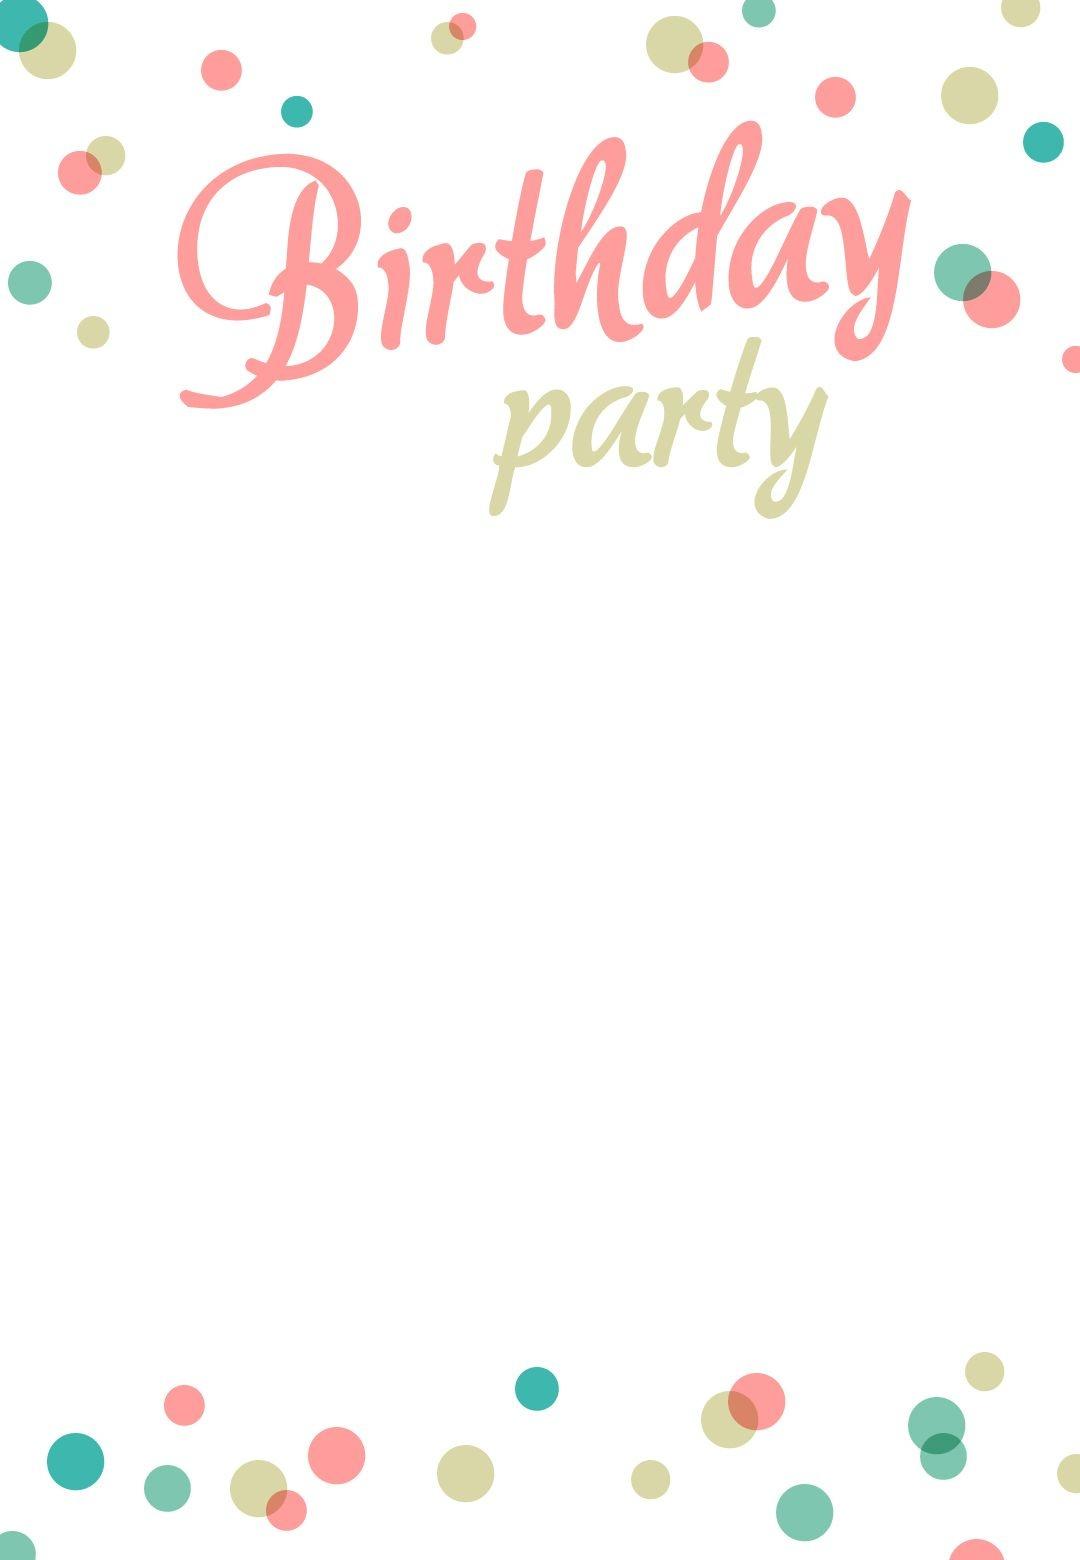 Birthday Party #invitation Free Printable | Images | Free Birthday - Free Printable Birthday Invitation Cards Templates